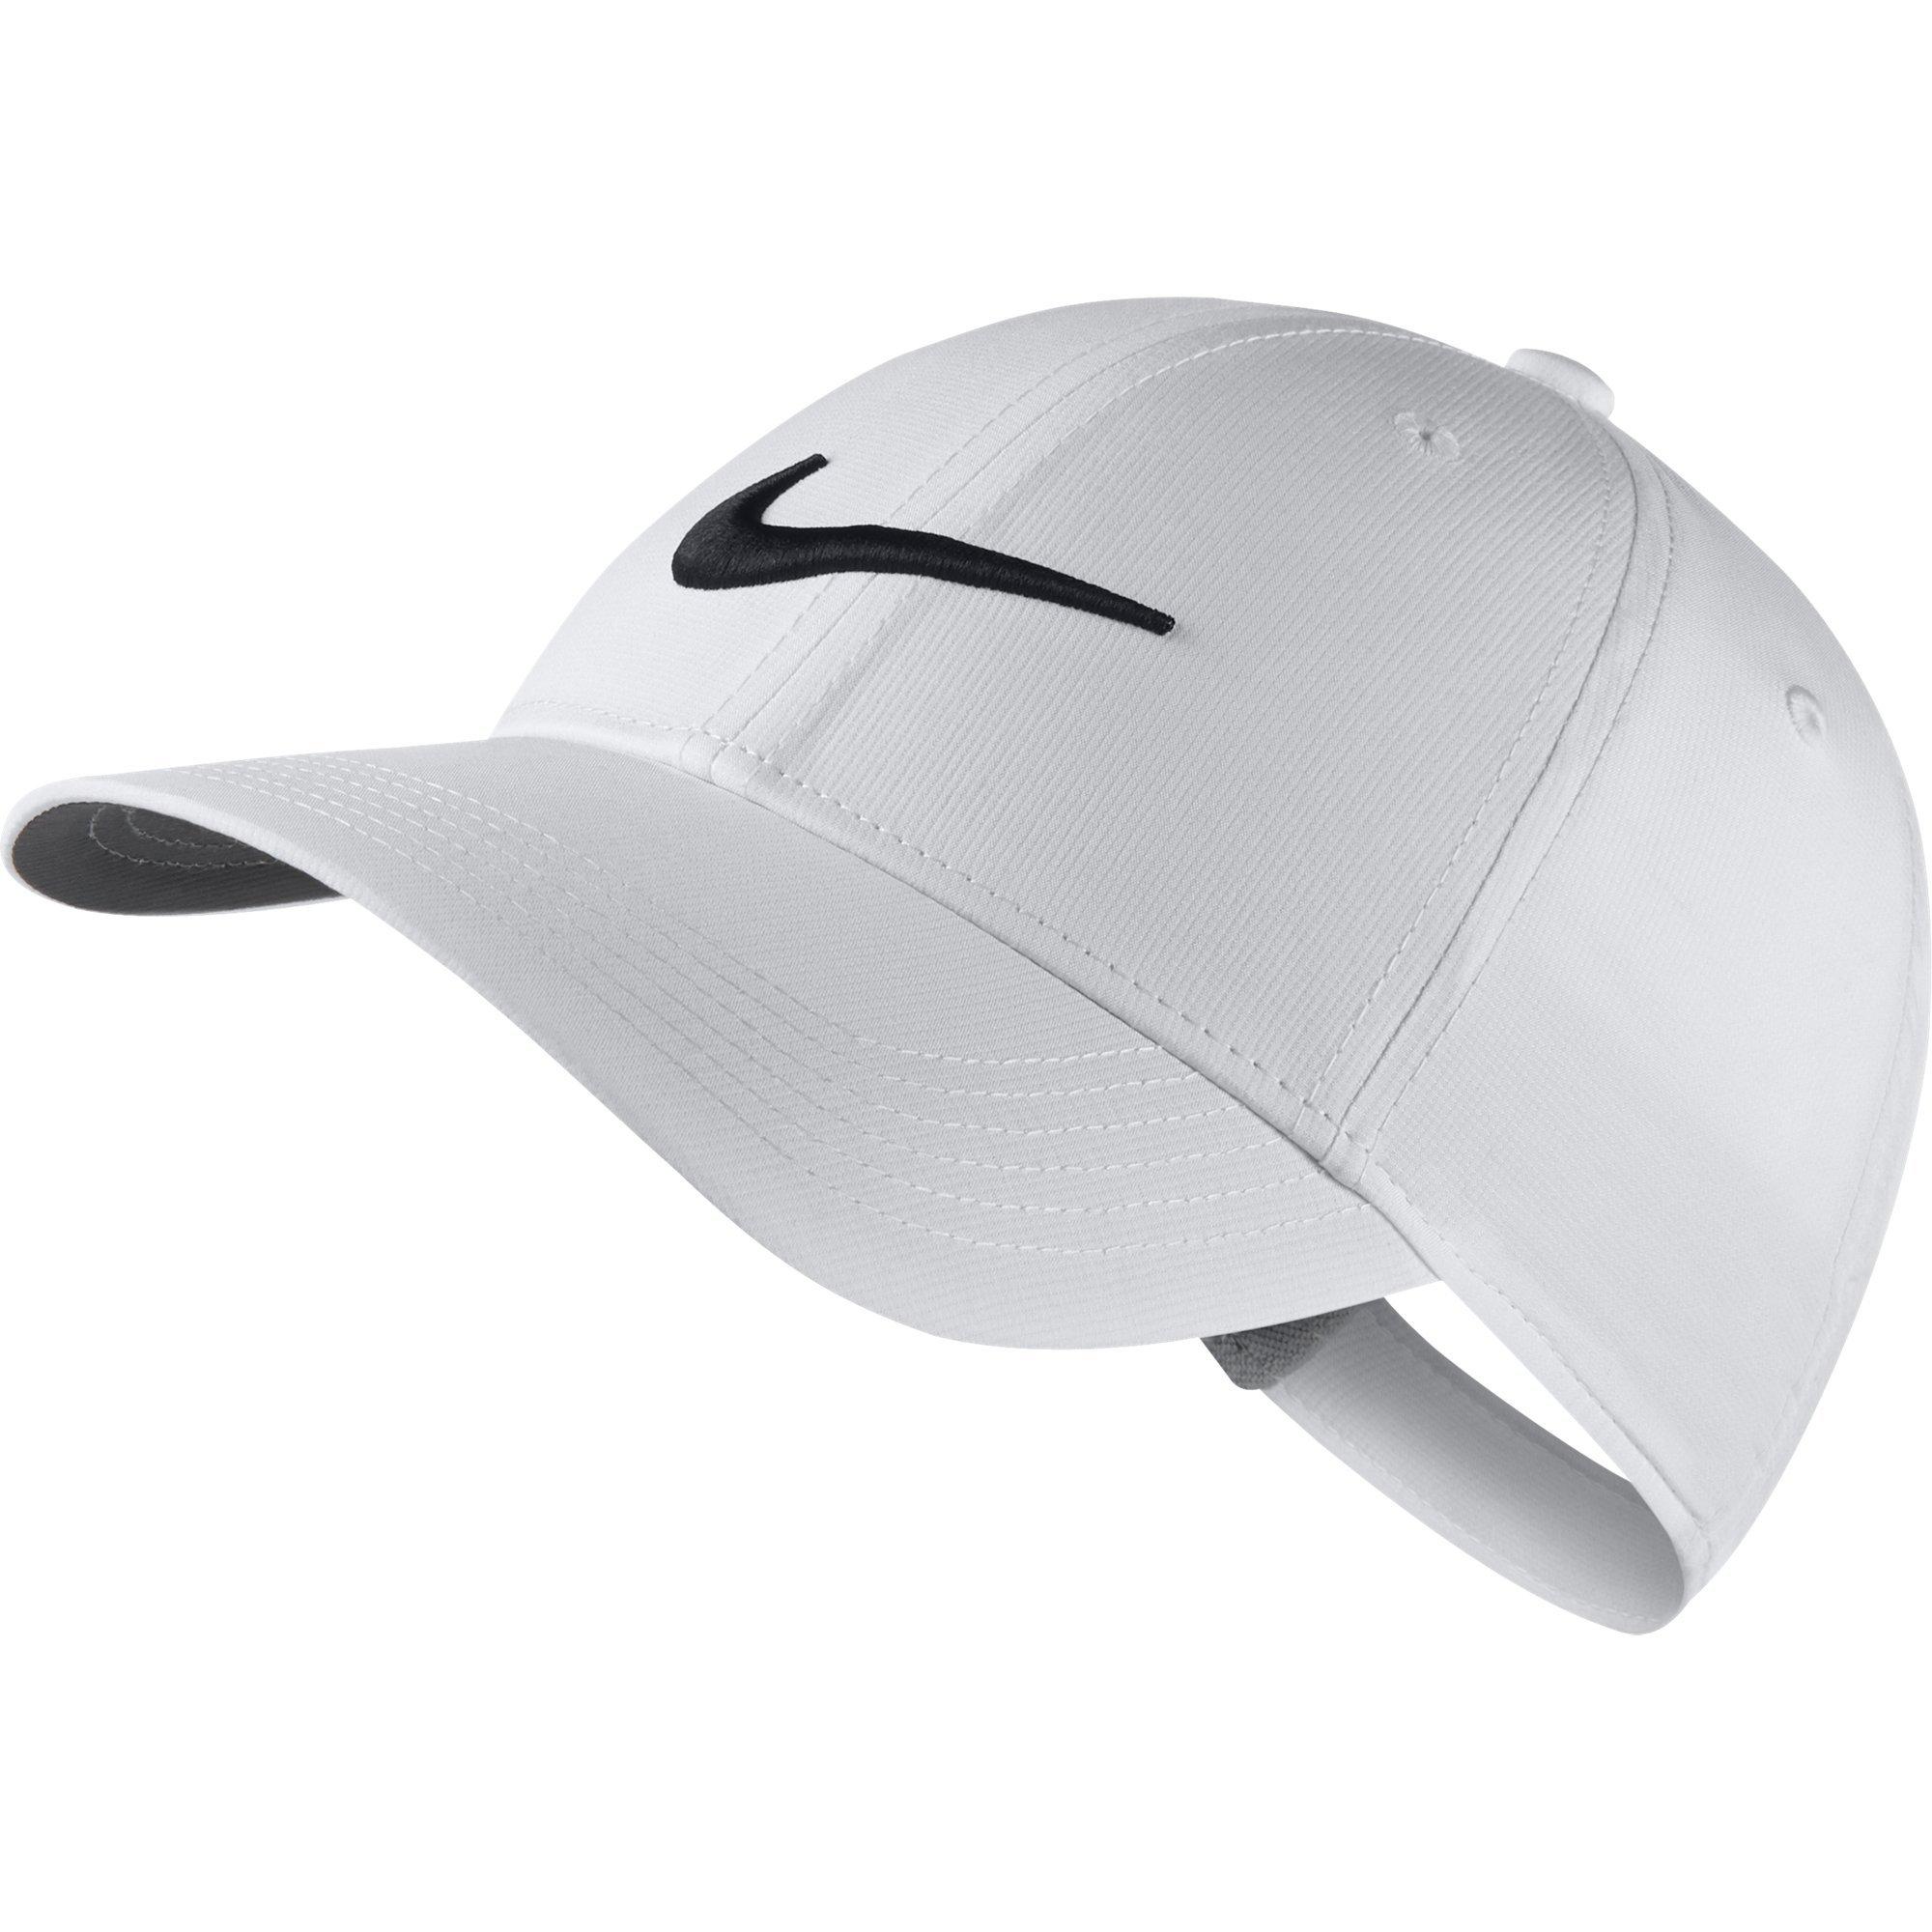 NIKE Kid's Unisex Core Golf Cap, White/Anthracite/Black, One Size